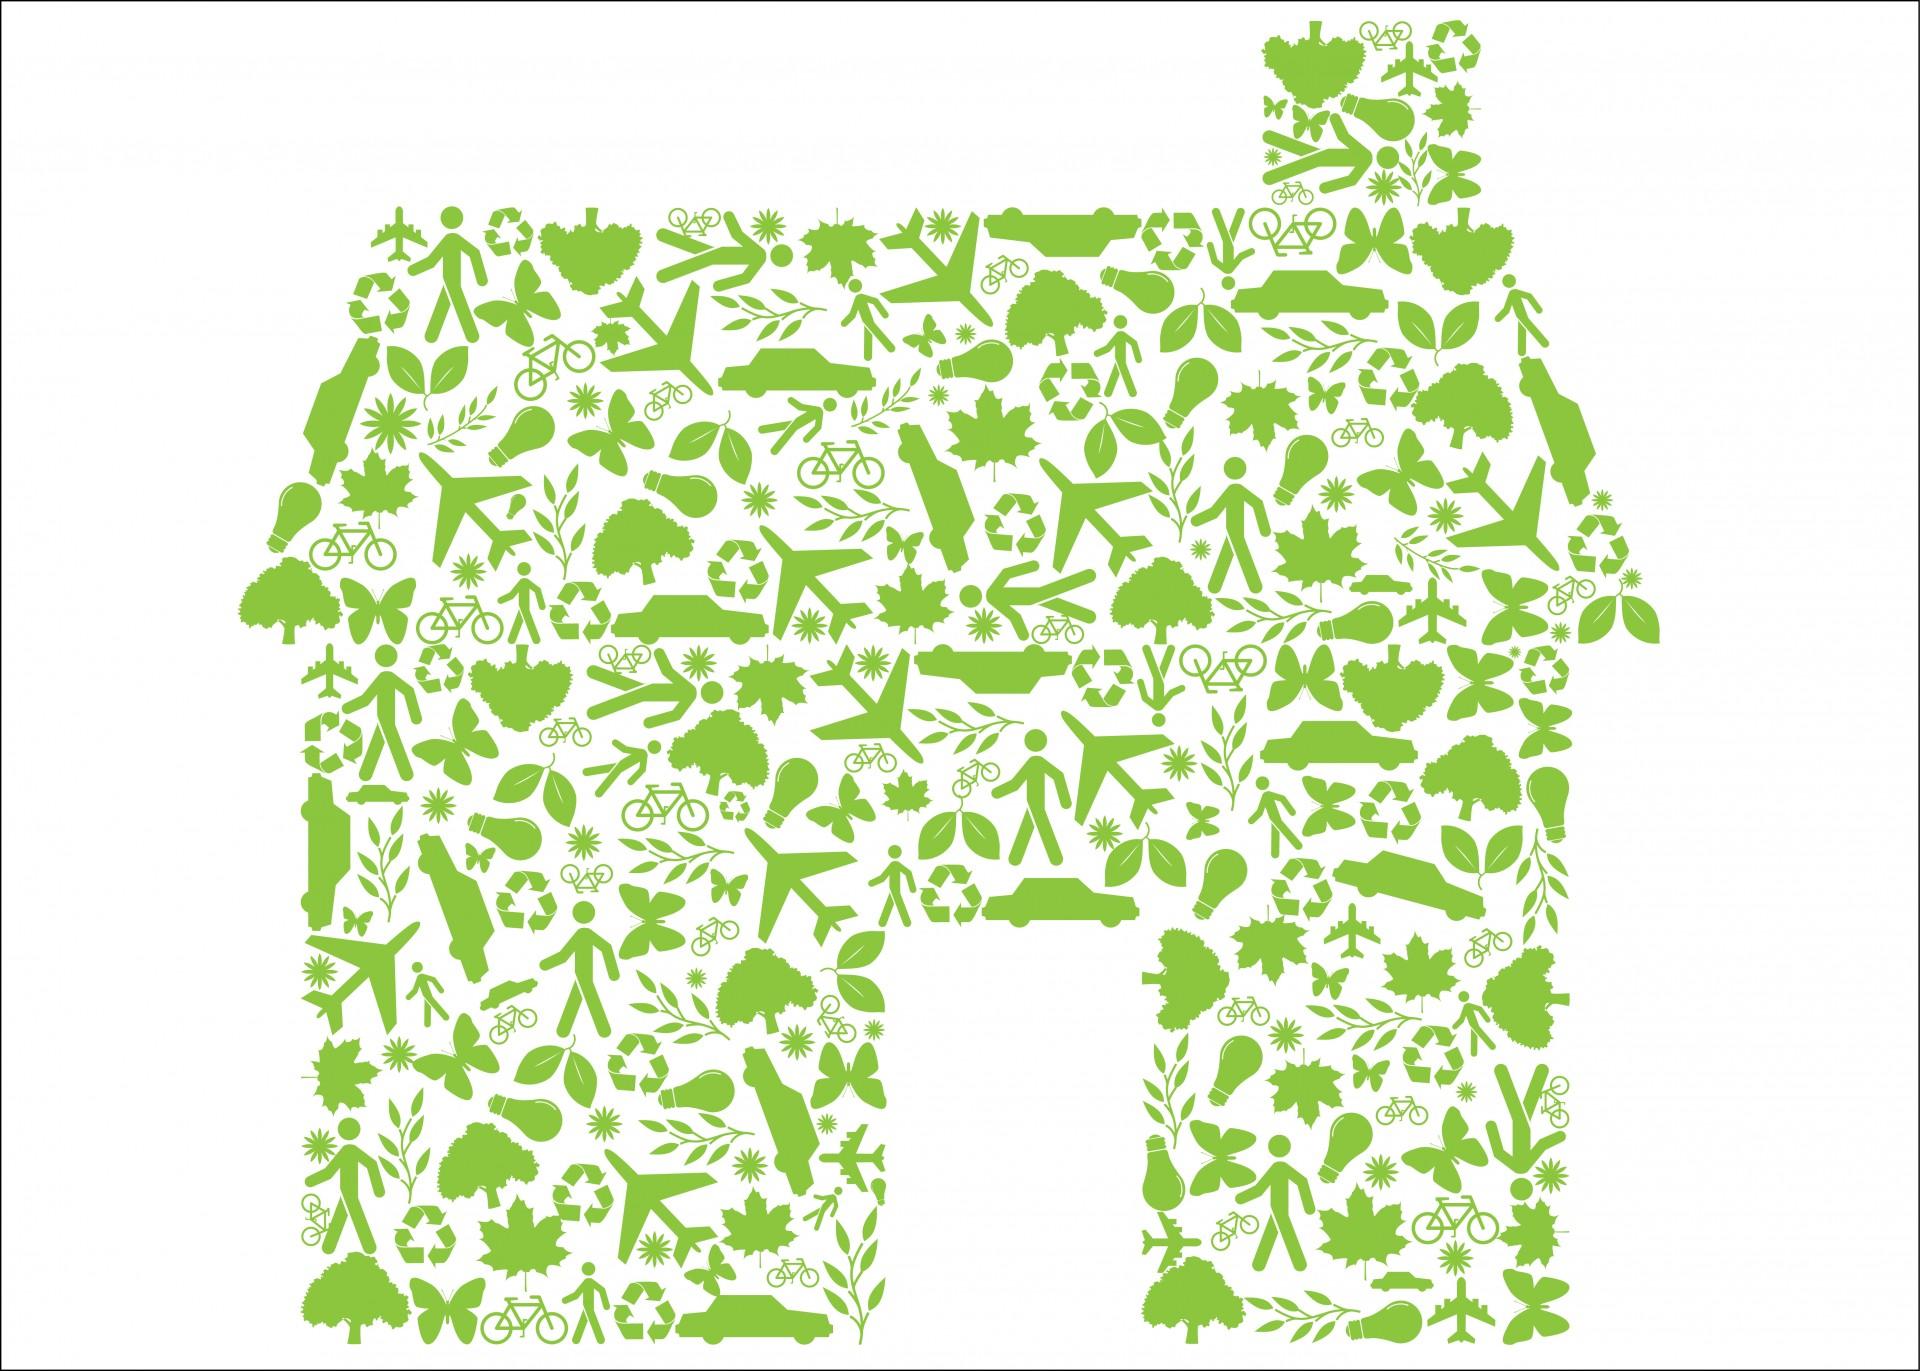 ecofriendly home design